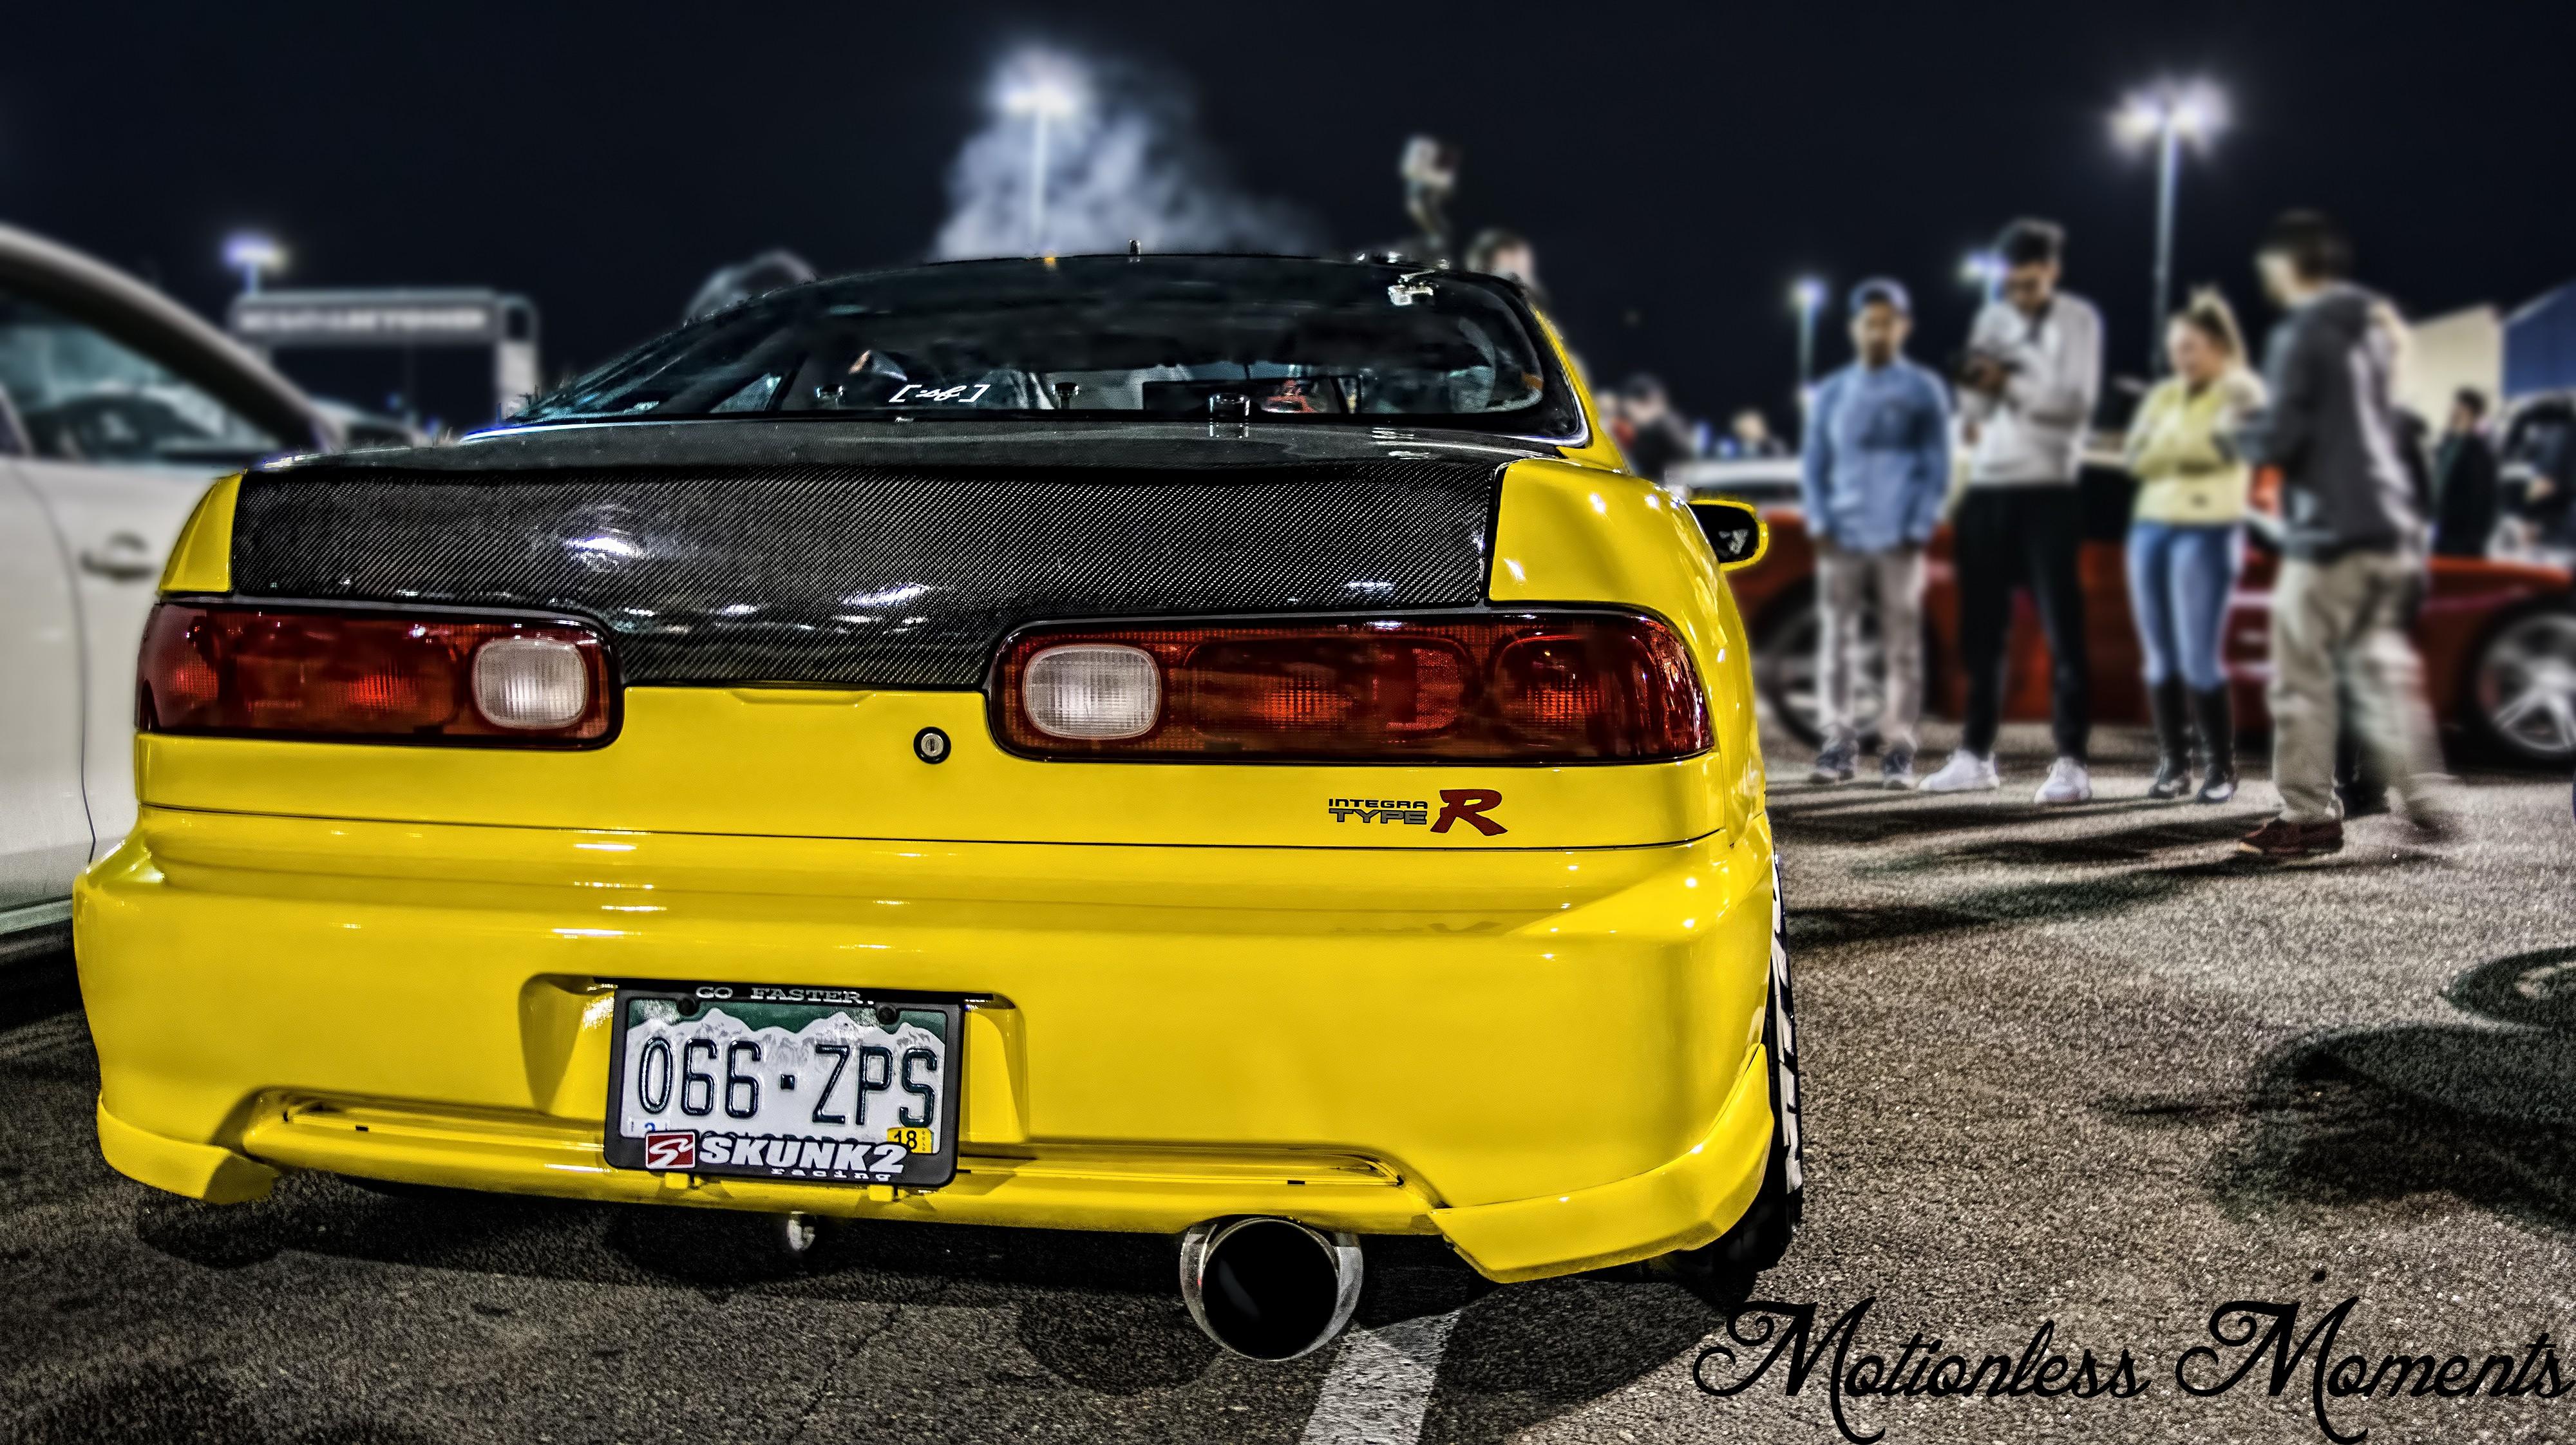 wallpaper : yellow, jdm, sports car, coupe, performance car, honda